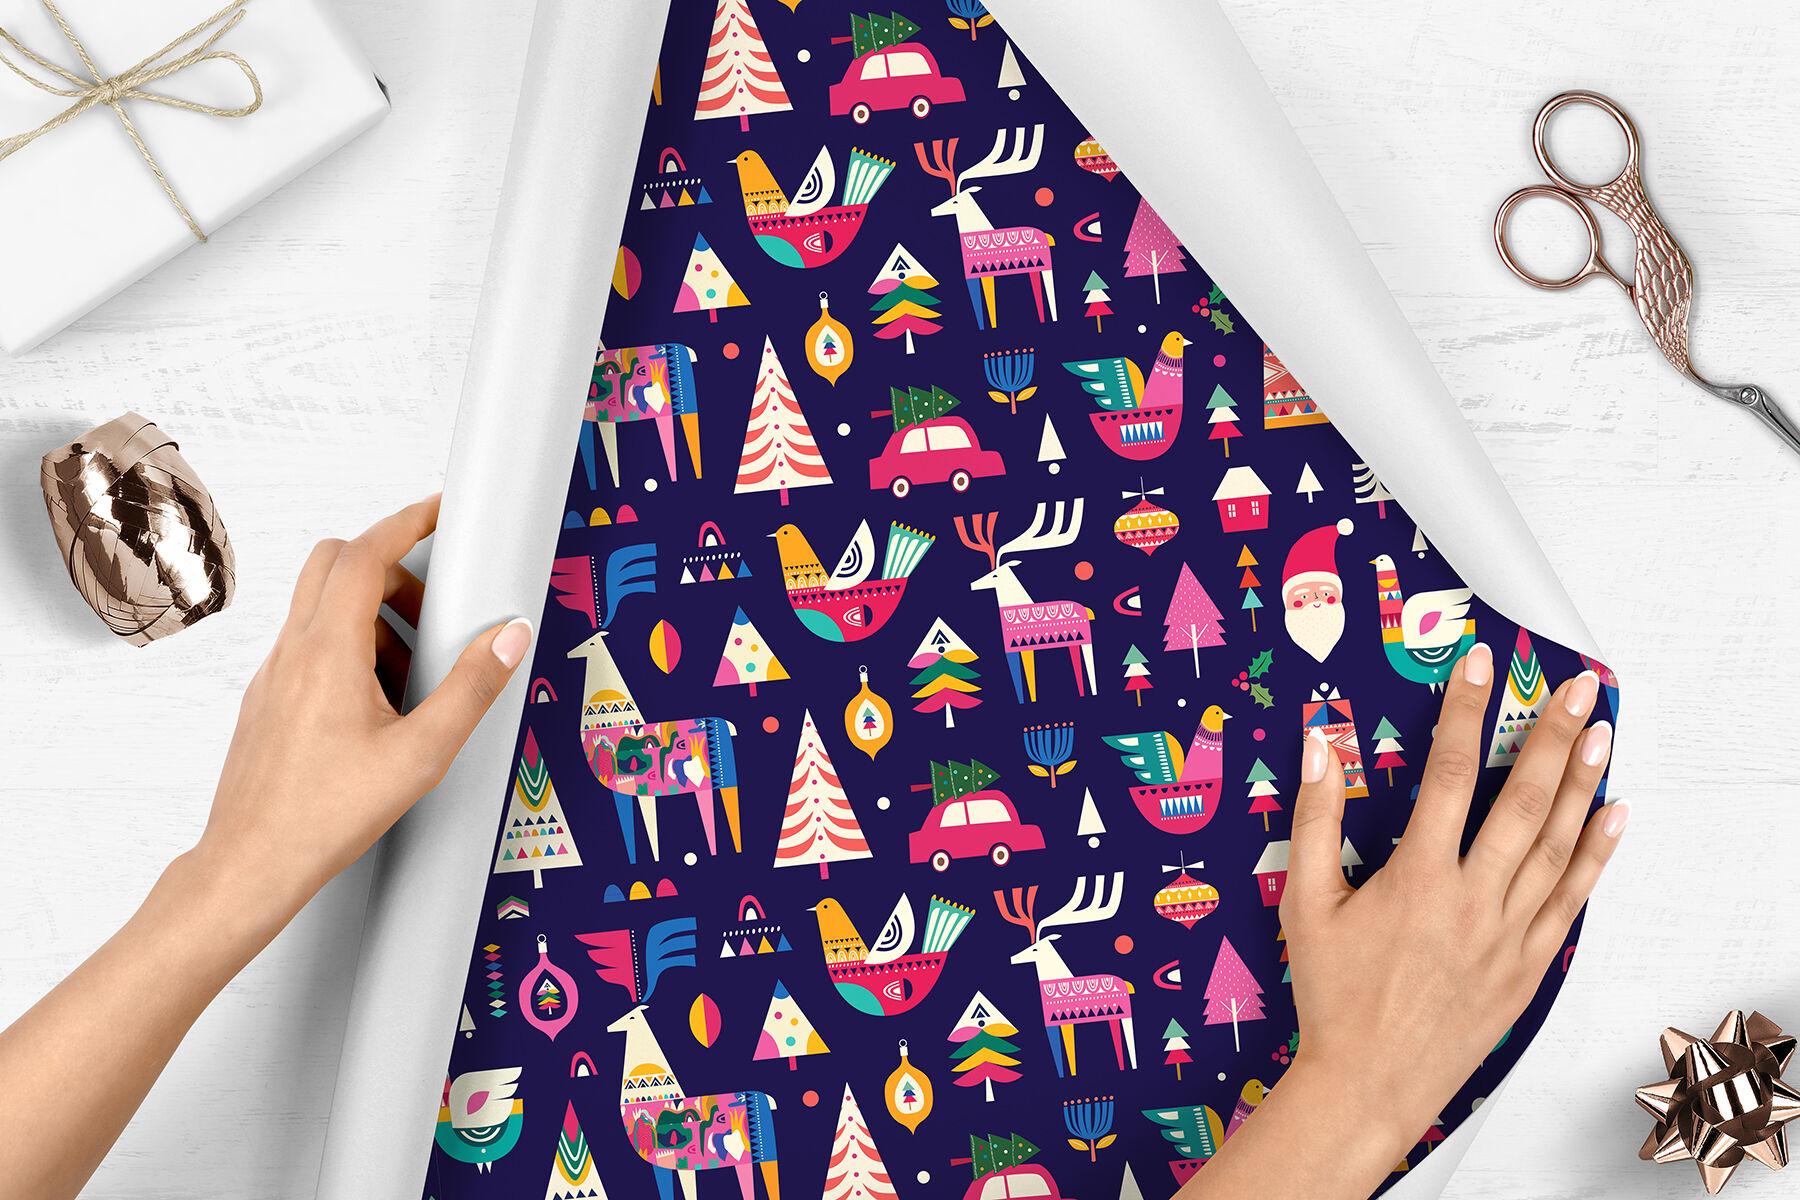 Christmas Collection By Molesko Studio Thehungryjpeg Com